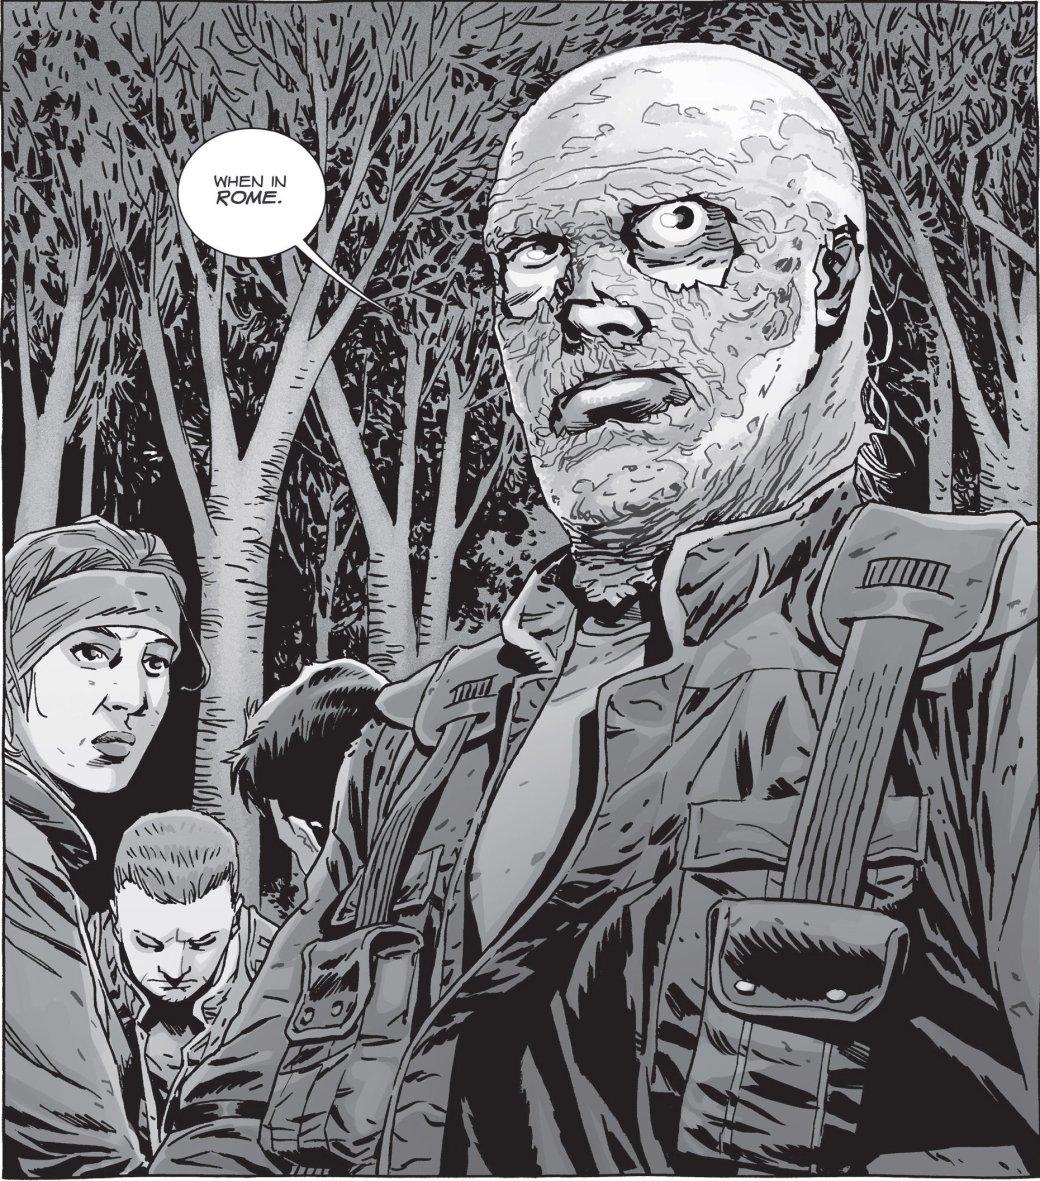 Война с Шепчущимися в комиксе The Walking Dead не оправдала ожиданий | Канобу - Изображение 16